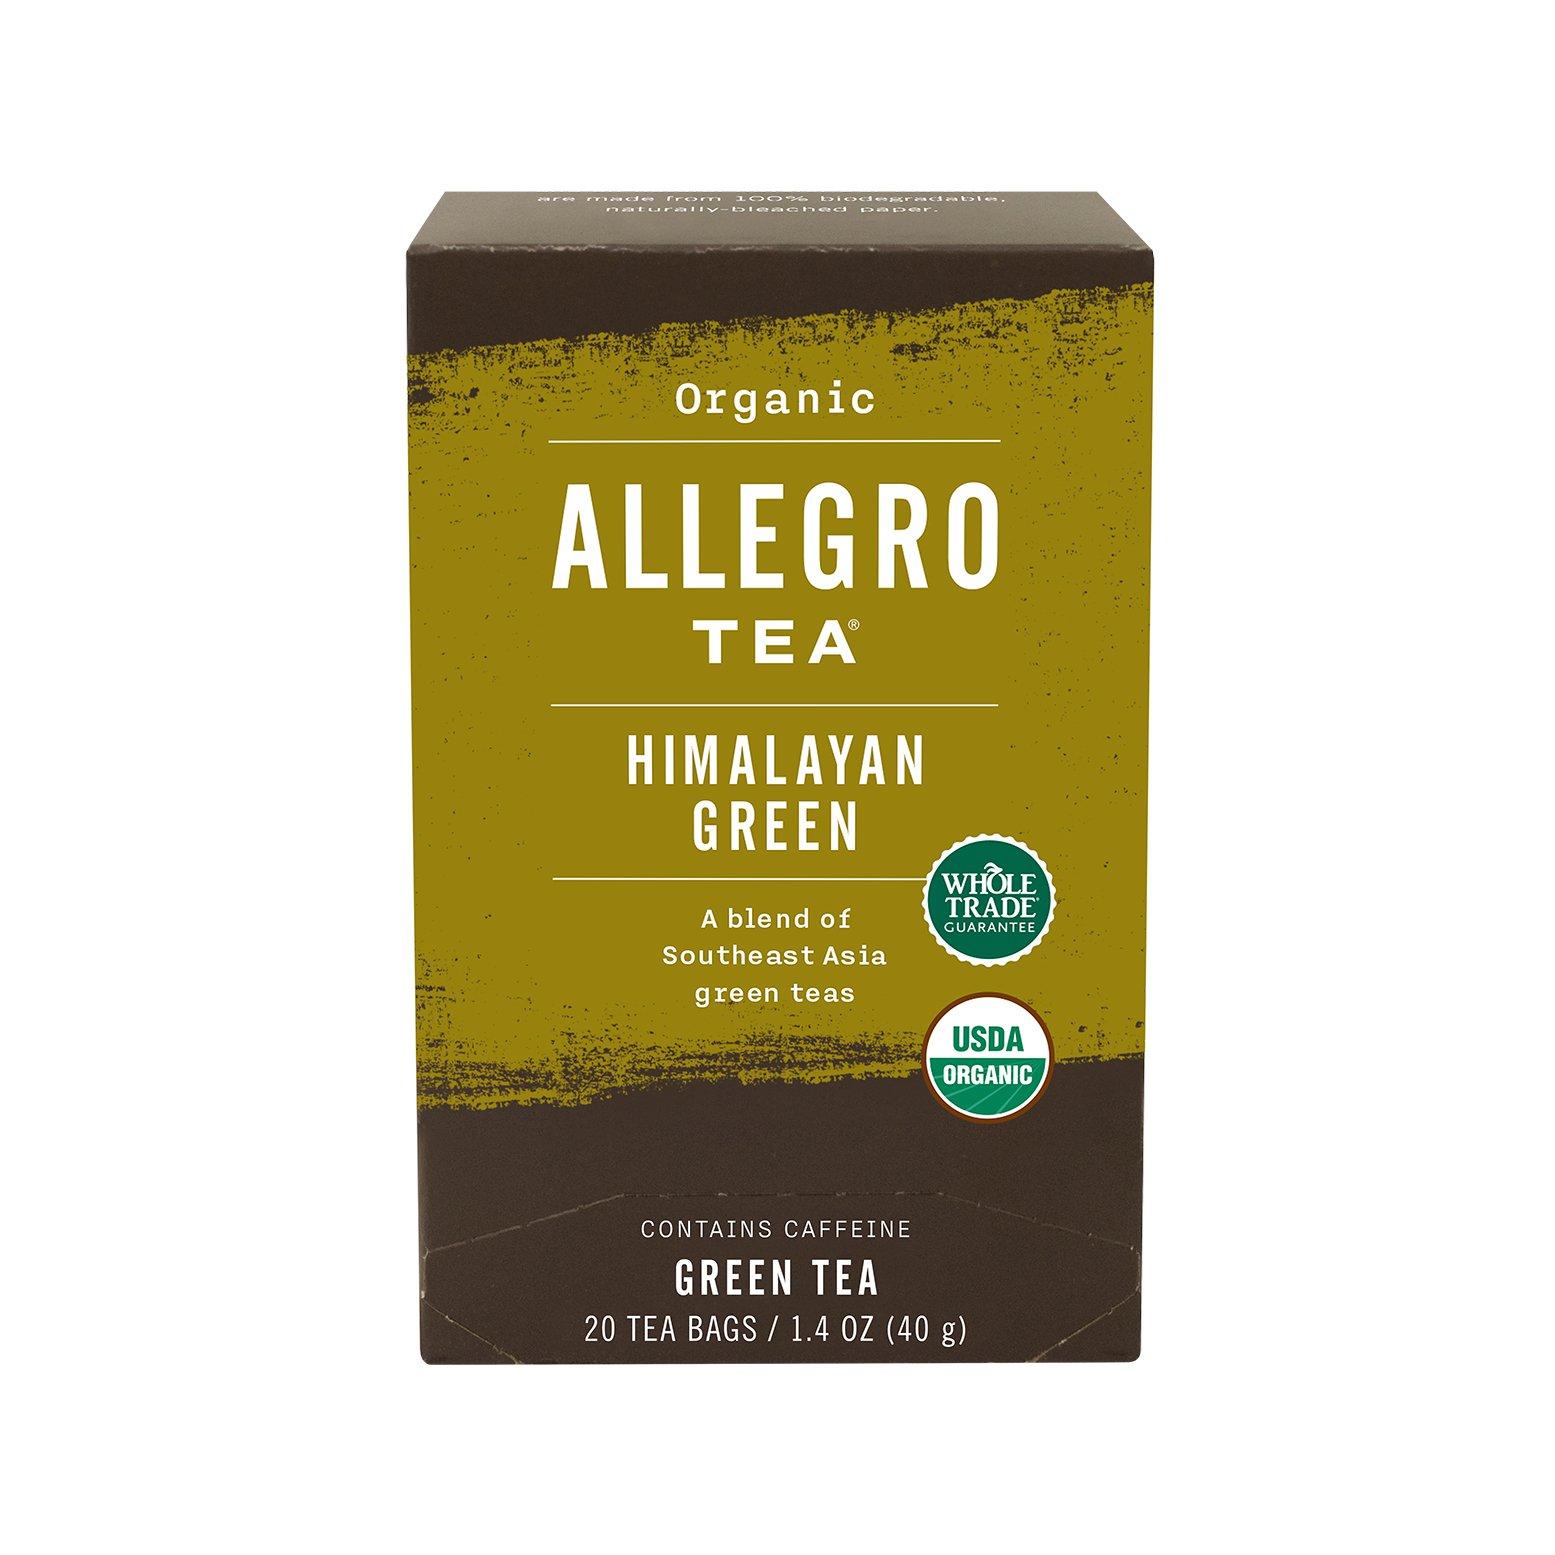 Allegro Tea, Organic Himalayan Green Tea Bags, 20 ct